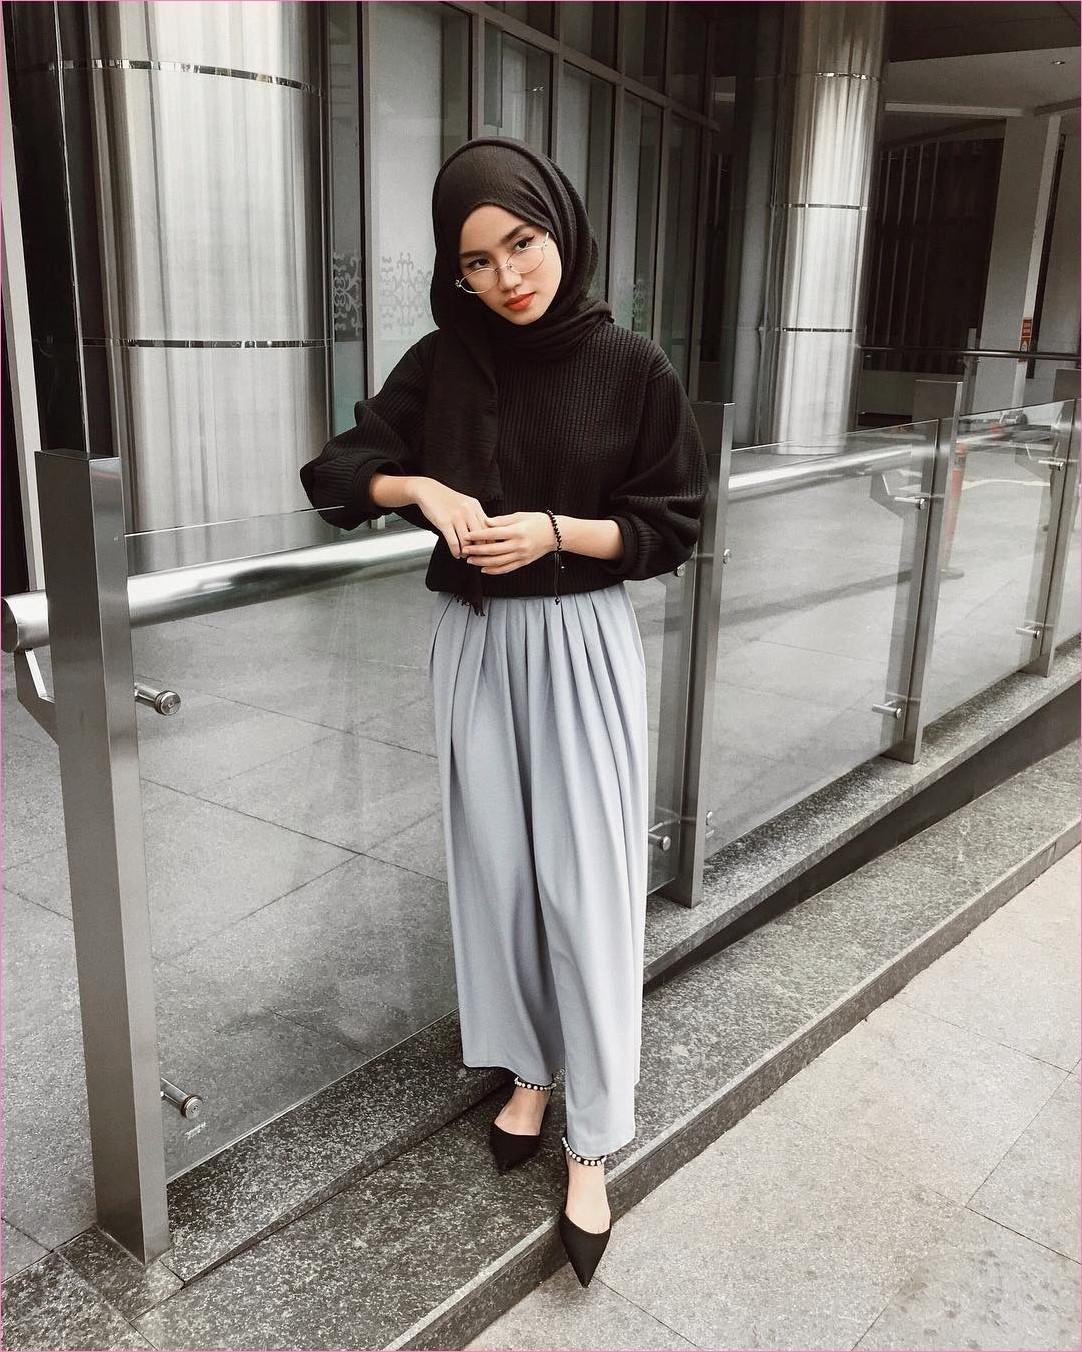 Outfit Kerudung Pashmina Ala Selebgram 2018 hijab pashmina rawis sweater hitam high heels sepatu cleopatra gelang tangan kacamata putih celana cullotes pallazo abu ootd trendy kekinian hijabers apartement hotel